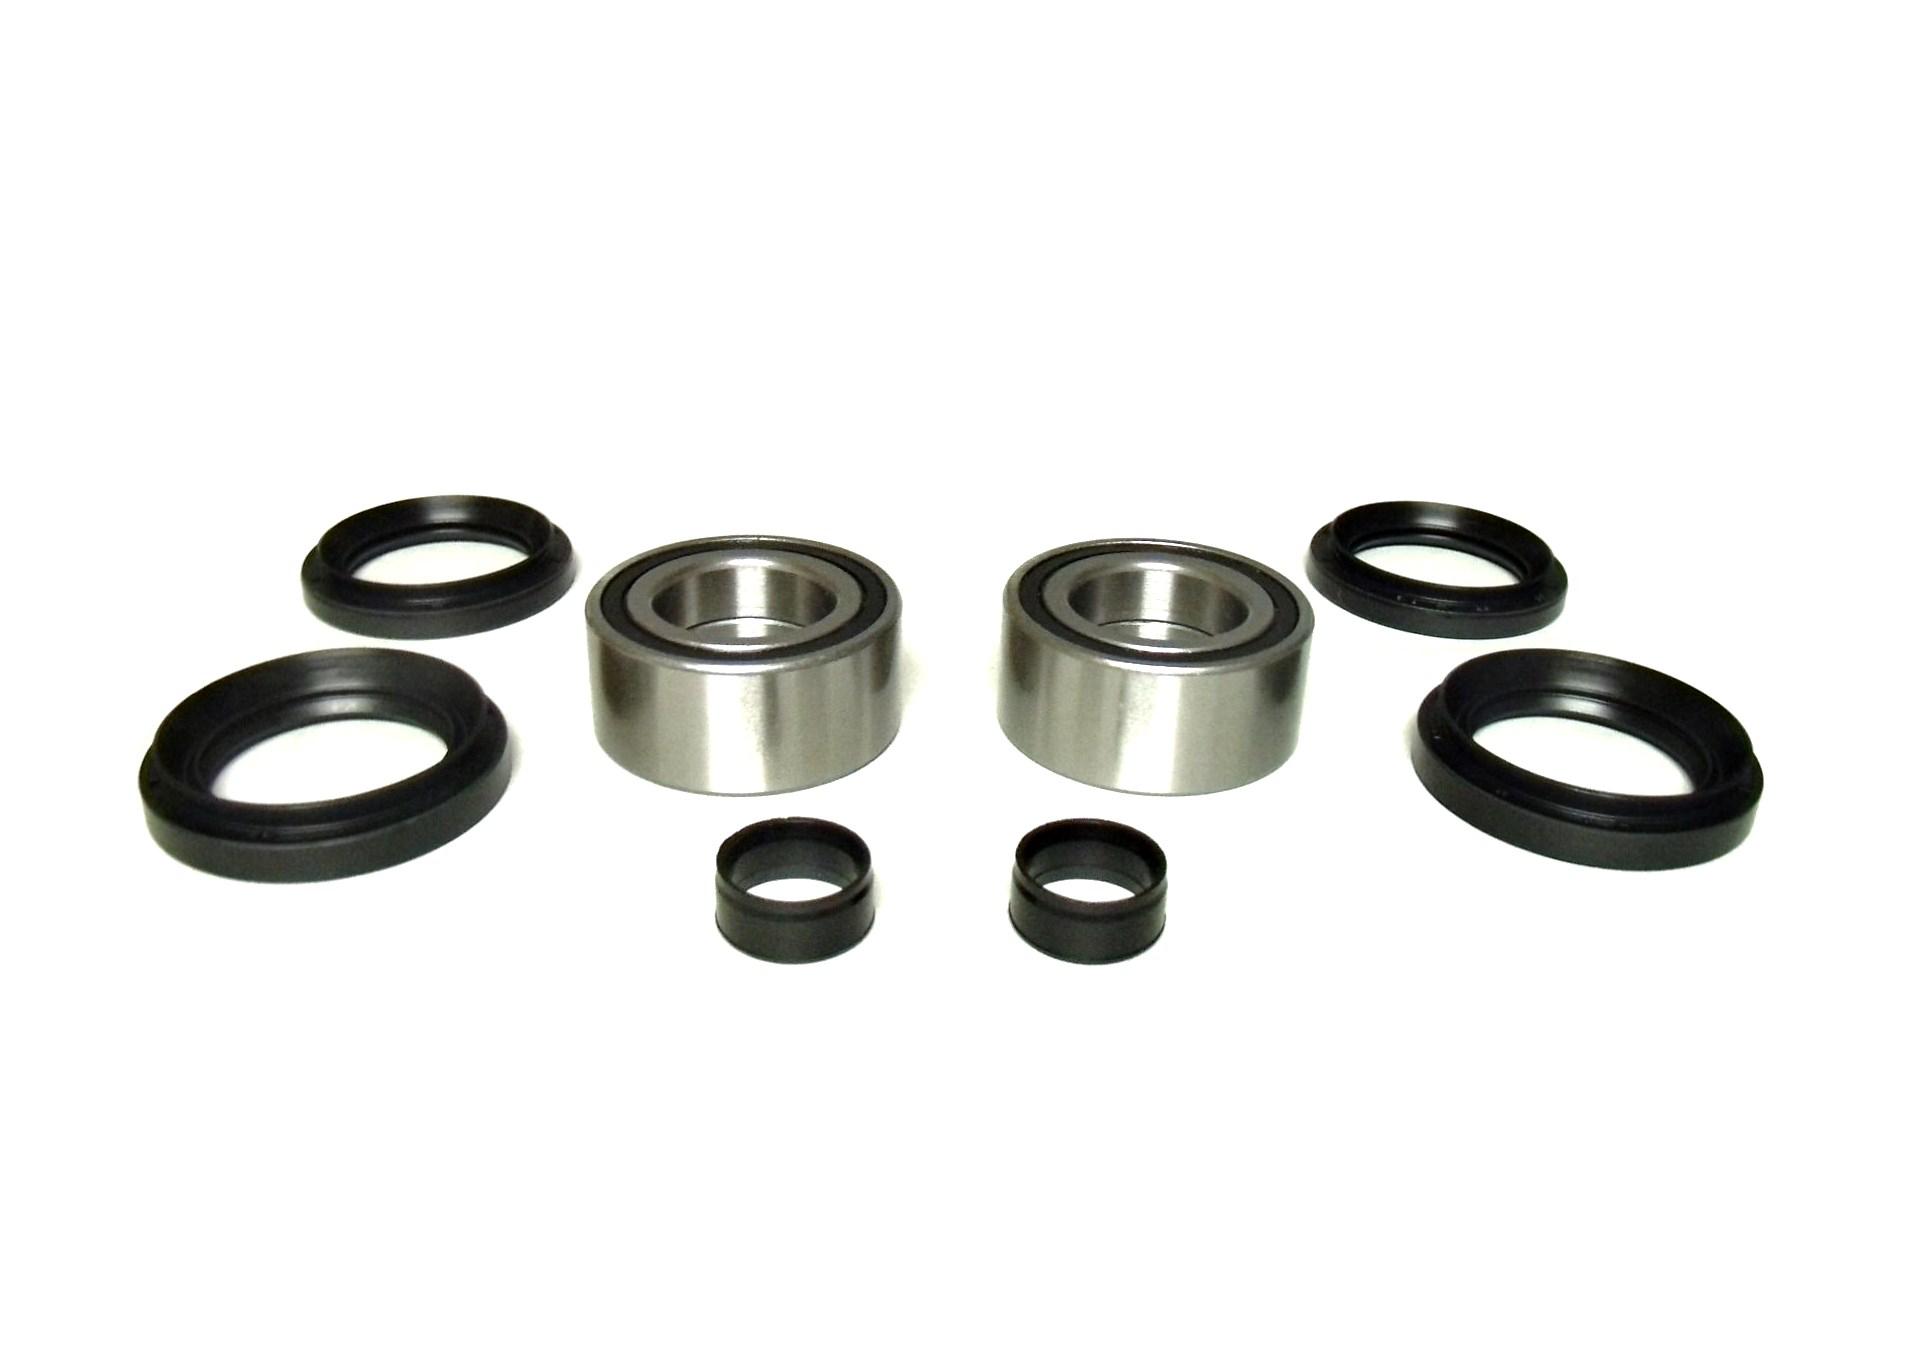 3554506 Pair of Front Wheel Bearing Kits for Polaris ATV 3554507 Fits 3610019